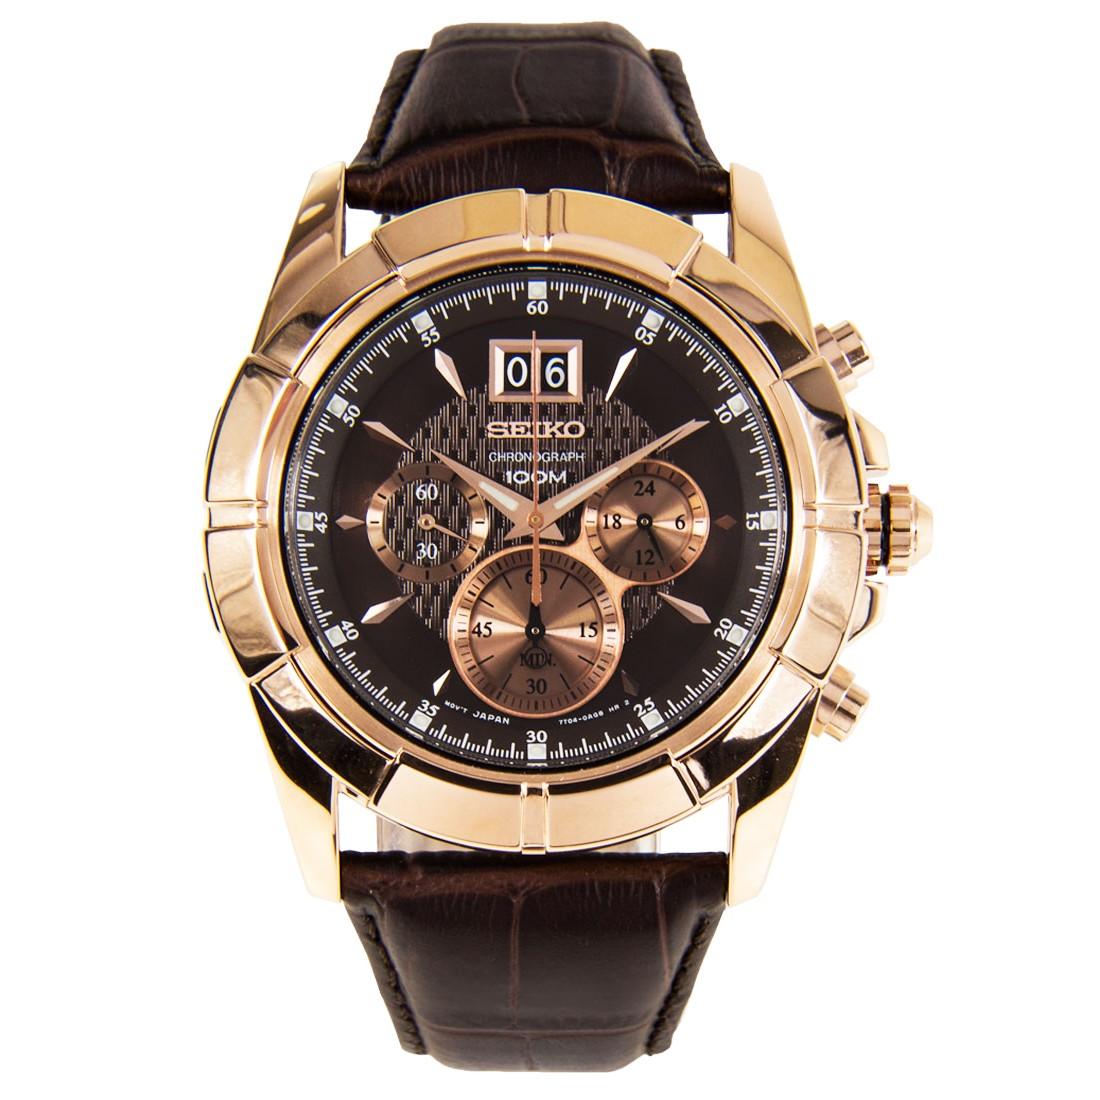 Seiko Lord Chronograph Mens Watch SPC114P1